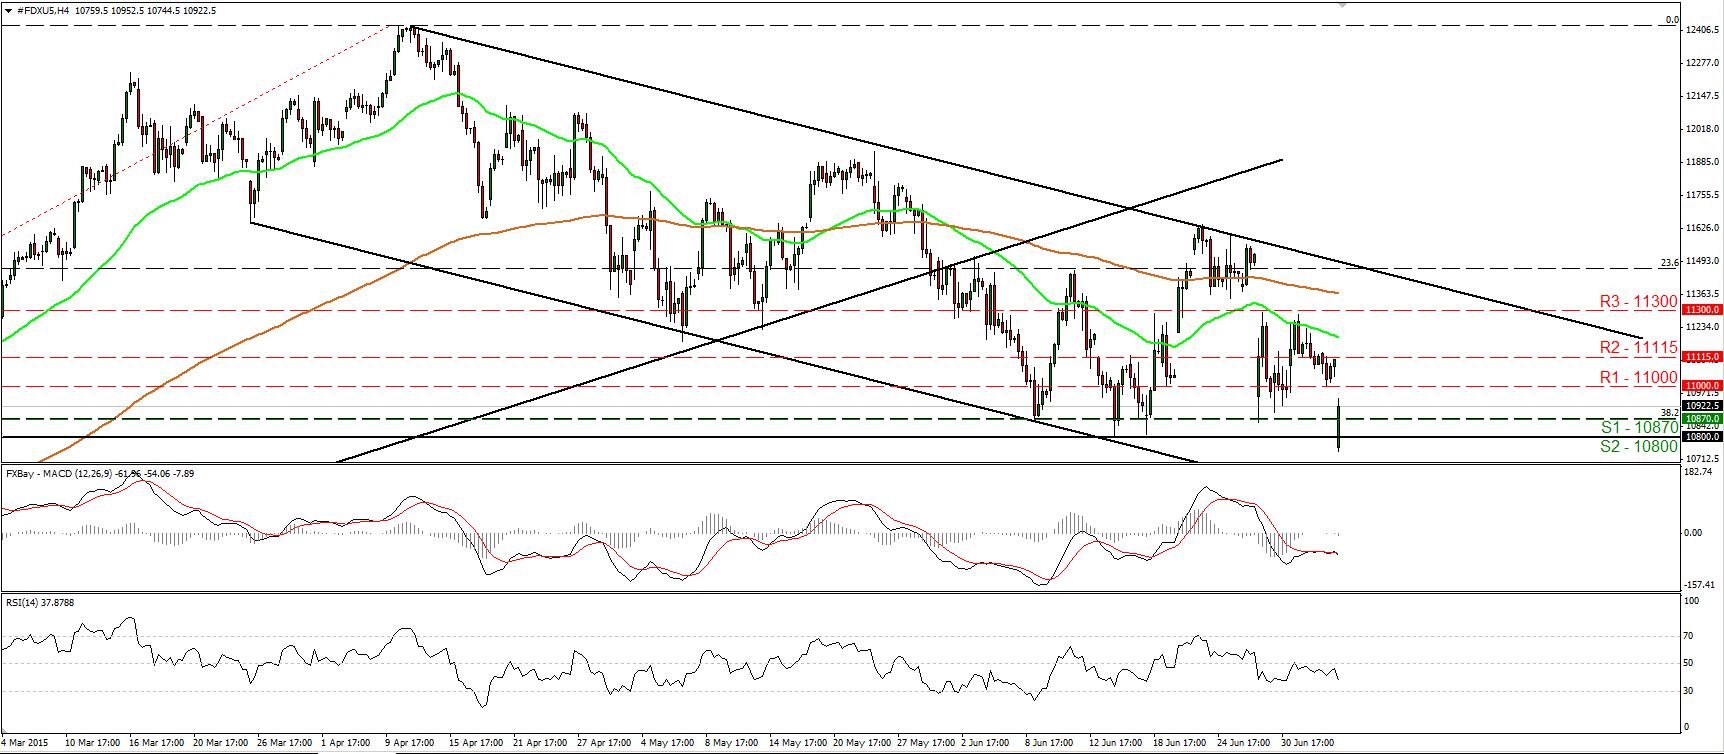 DAX_06July2015